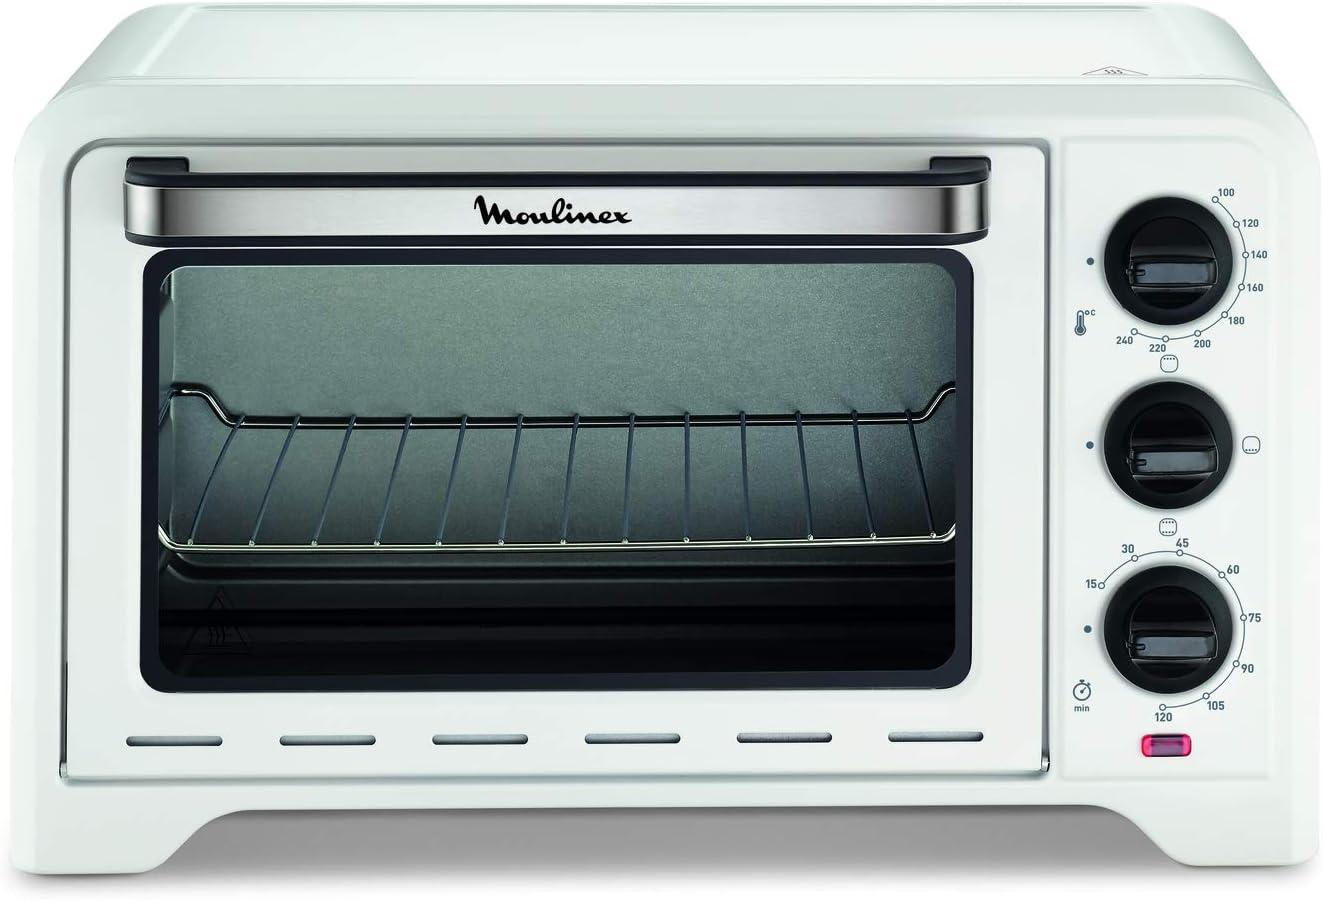 Moulinex Optimo OX441110 - Horno, 19 L, color blanco: Amazon.es: Hogar